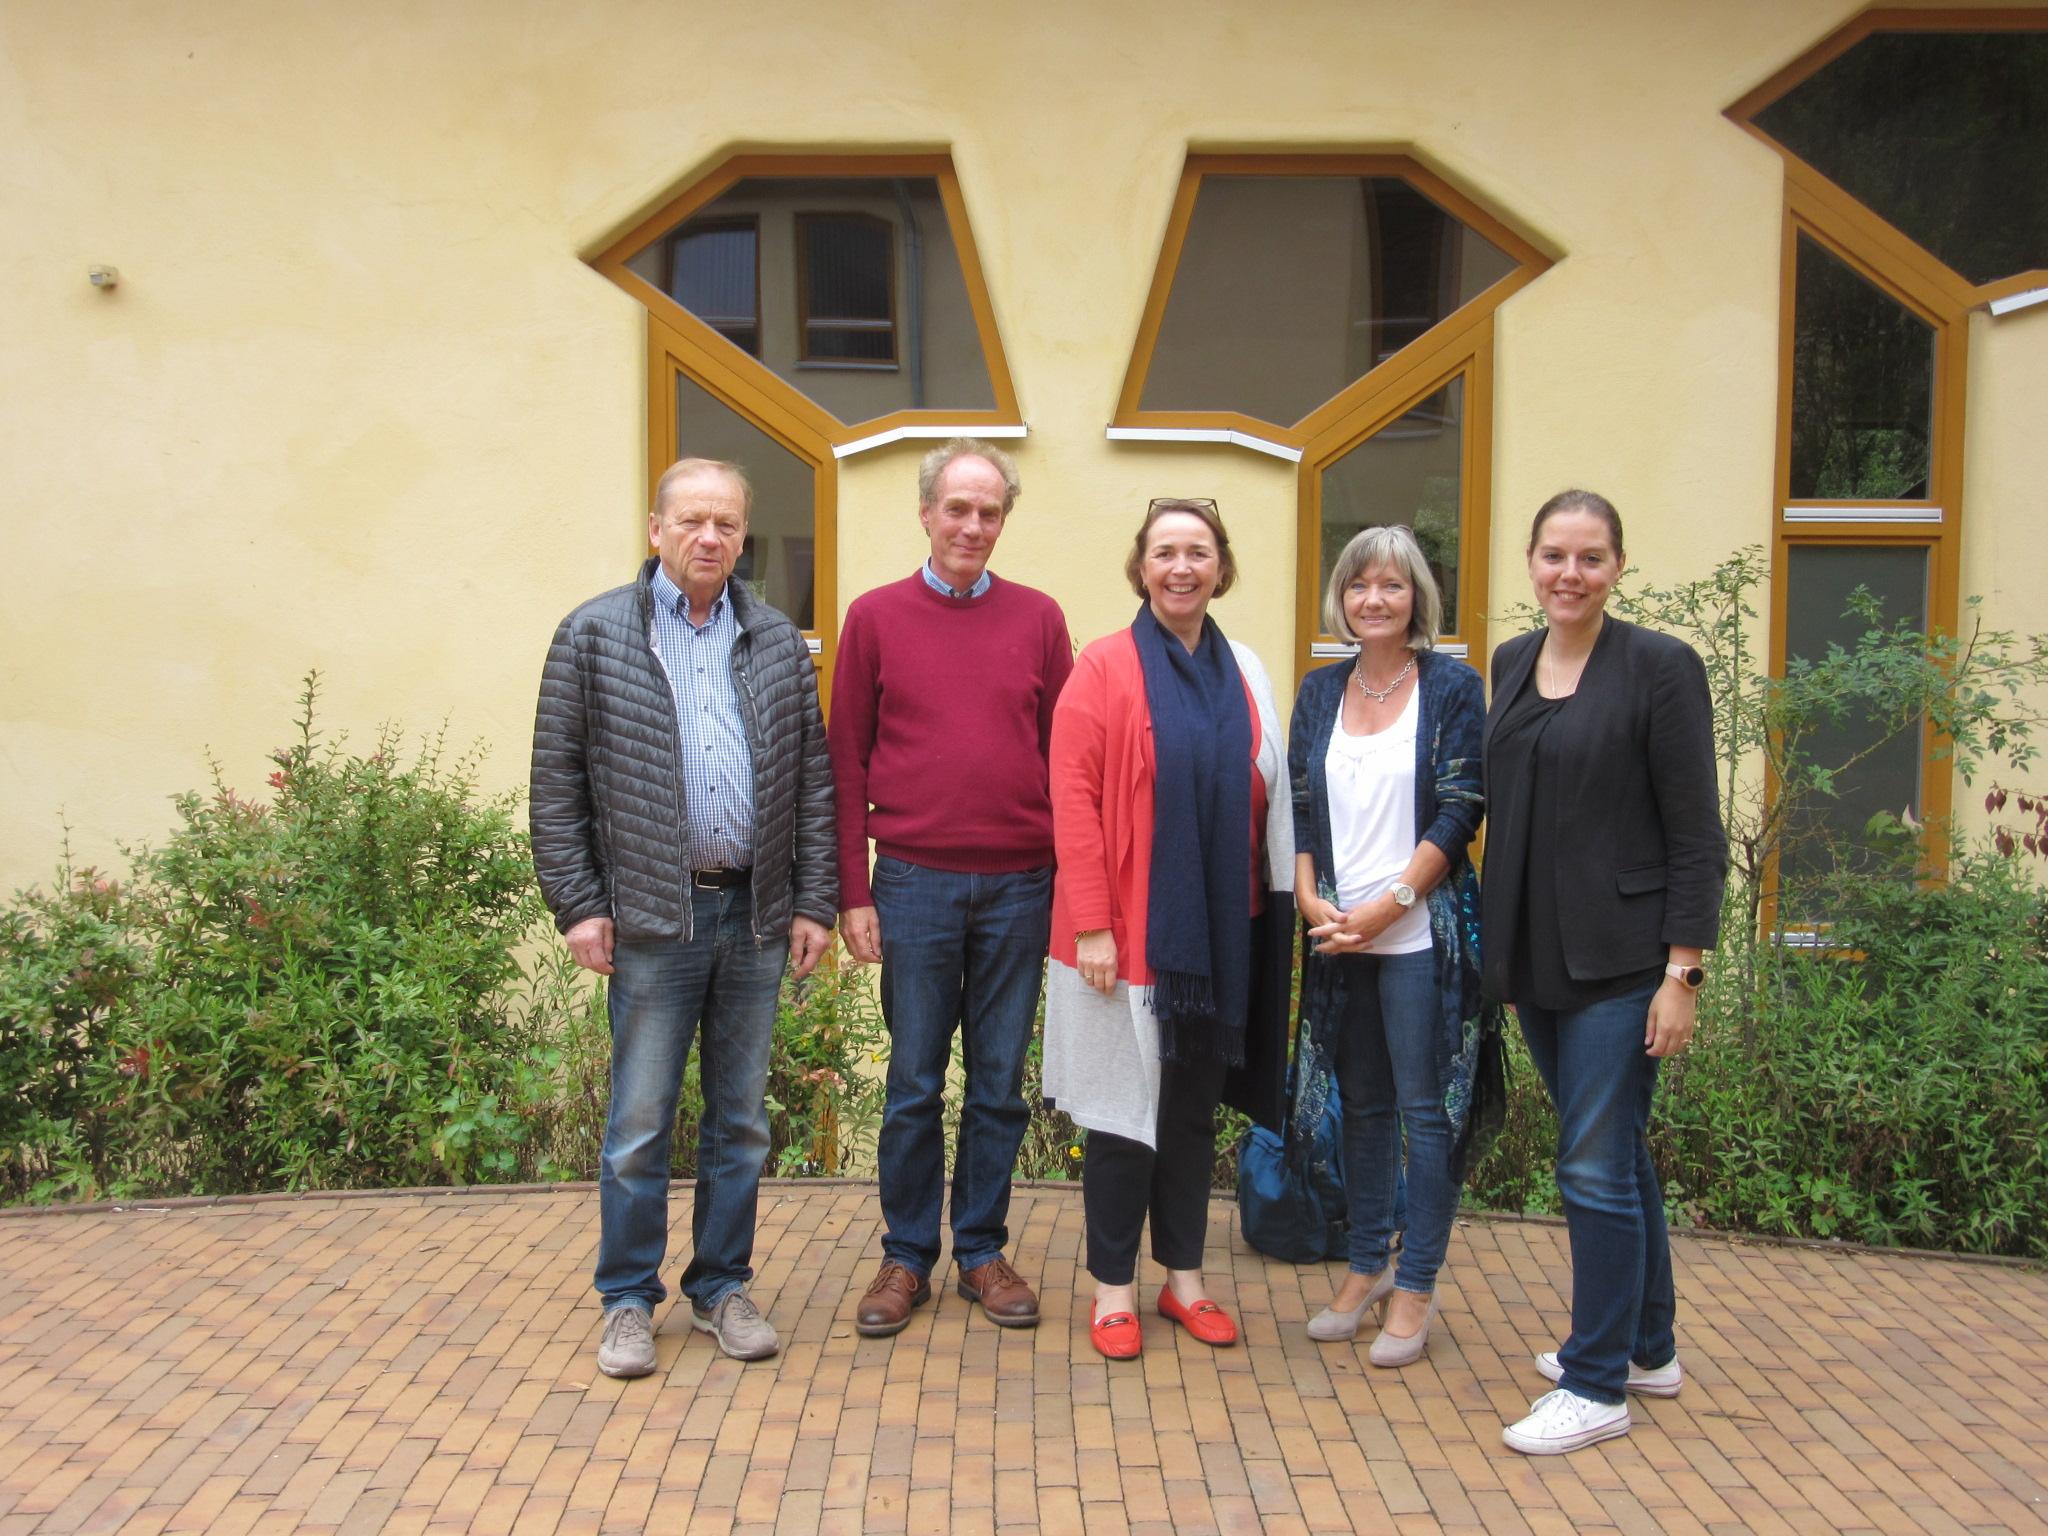 V.l.n.r.: Klaus Volker Walter, Martin Cuno, Angela Freimuth, Silvia Perthen, Franziska Müller-Rech